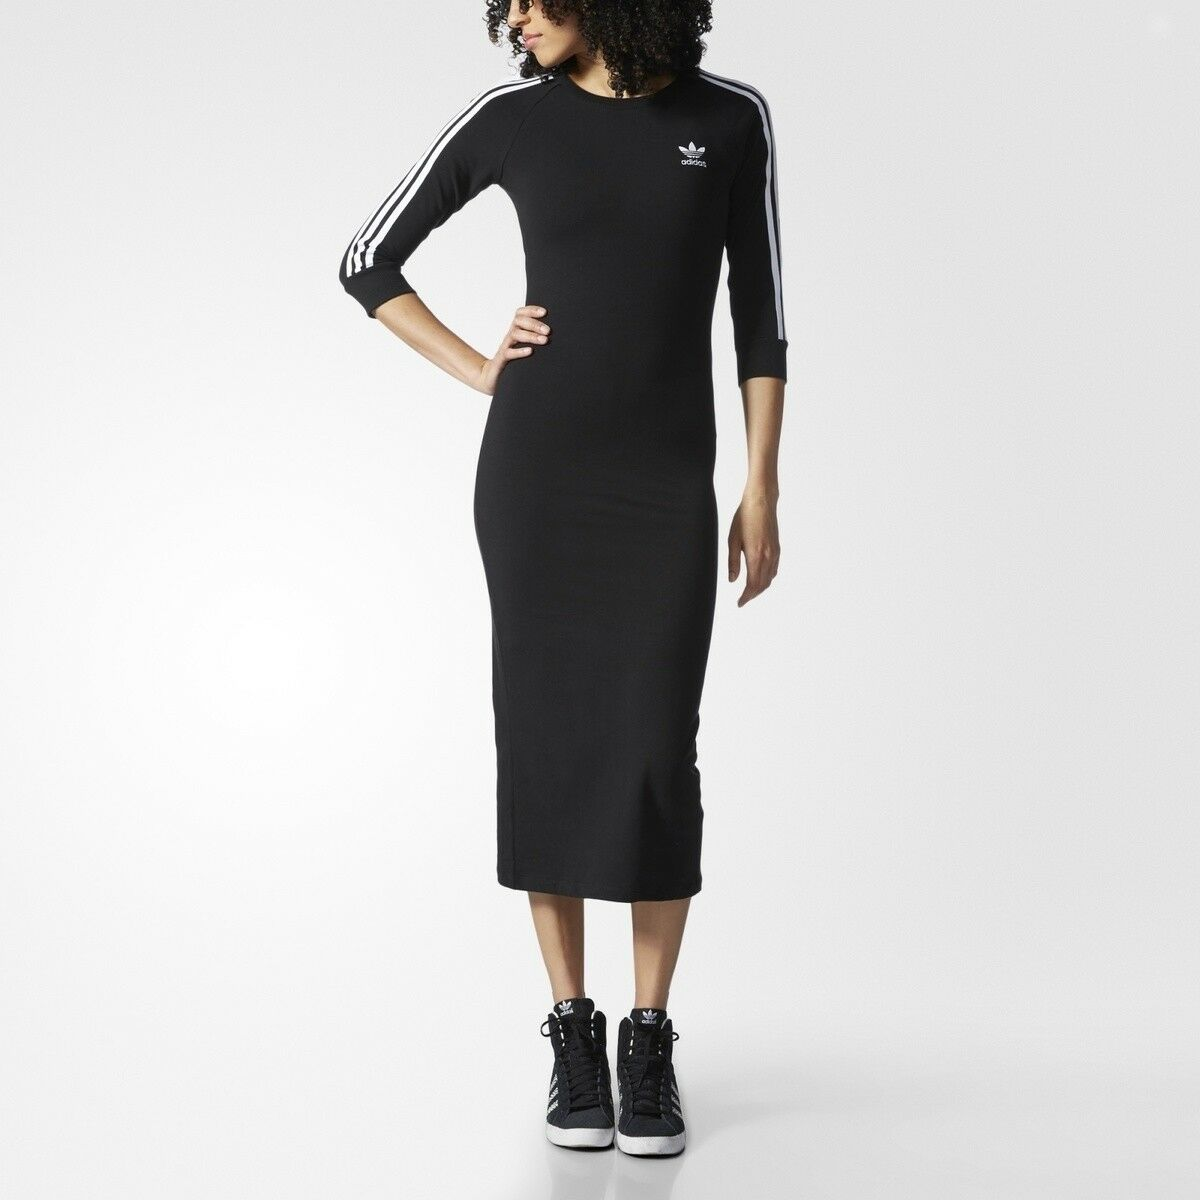 Adidas Originals Womens 3-Stripes Trefoil ruha AY5251 Fit Feszes fekete Noir Ritka